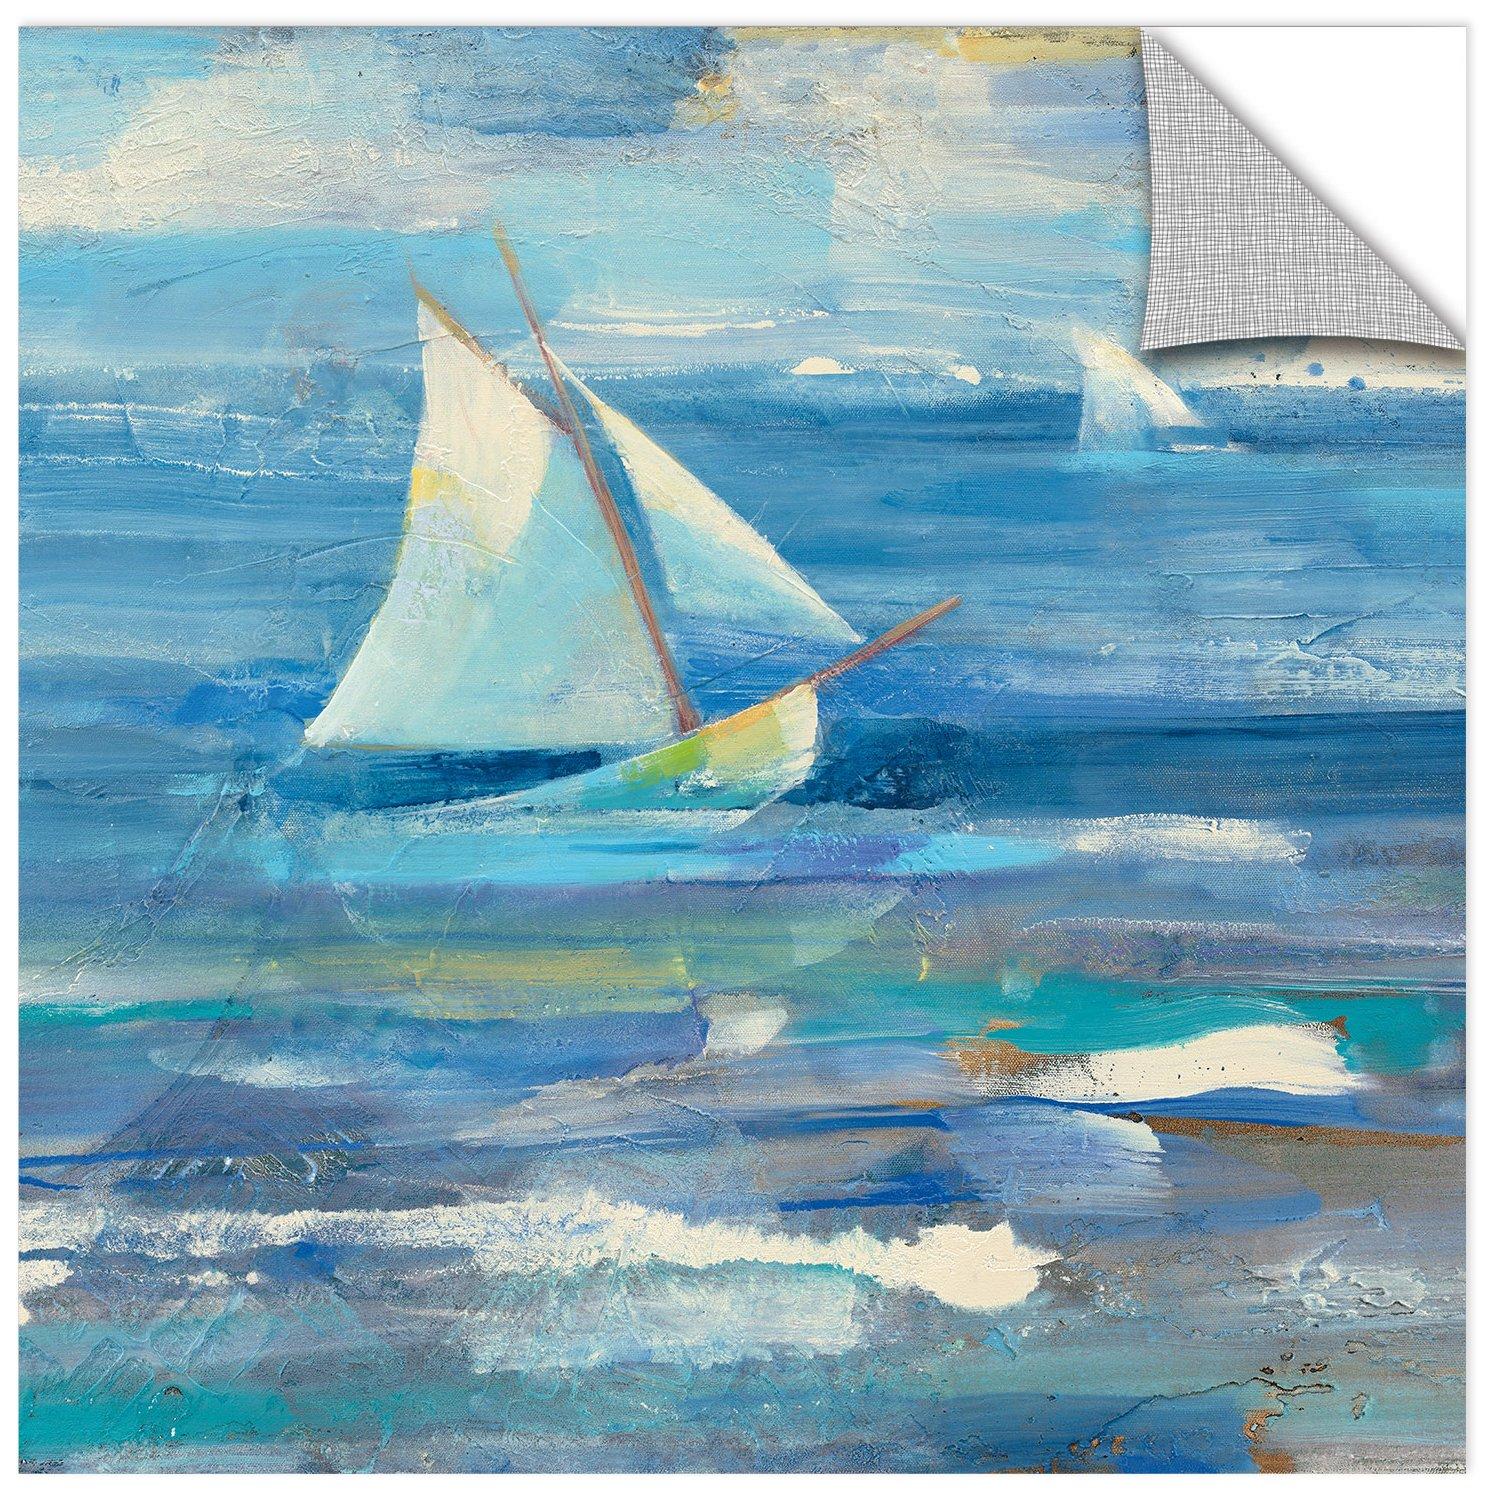 36 x 36 ArtWall Albena Hristovas Ocean Sail Removable Wall Art Mural